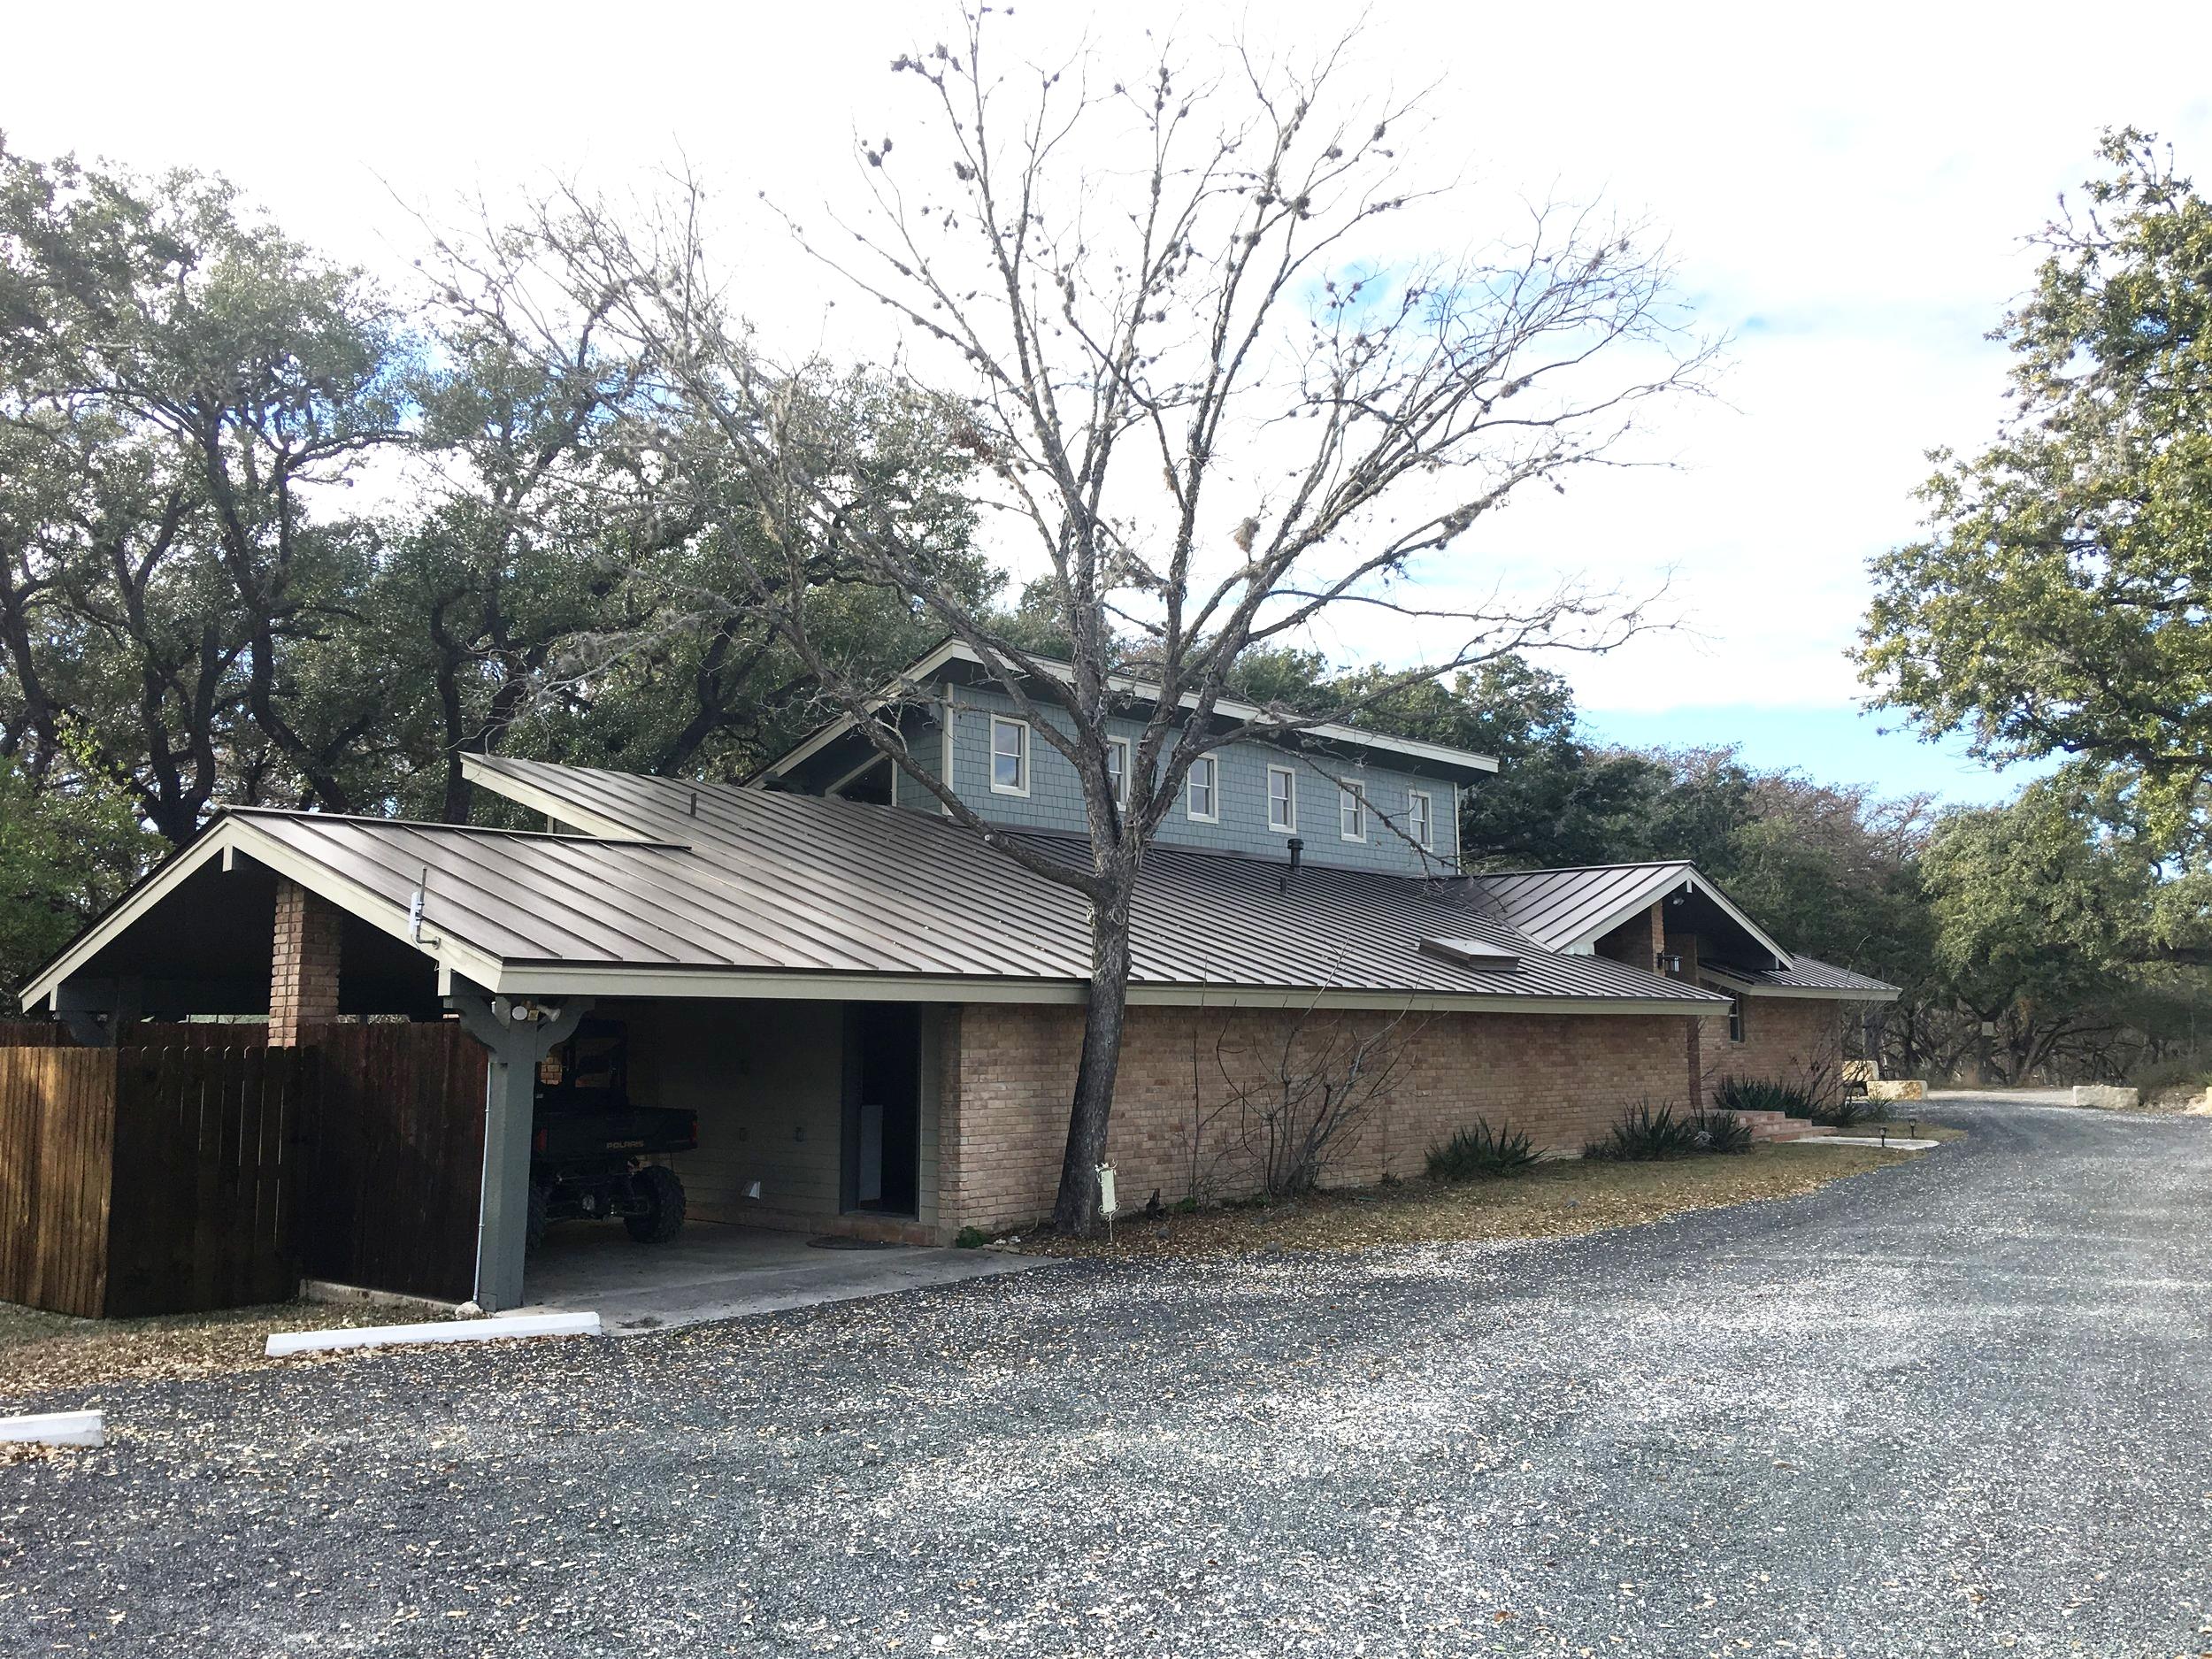 Rio Grande River House - Exterior